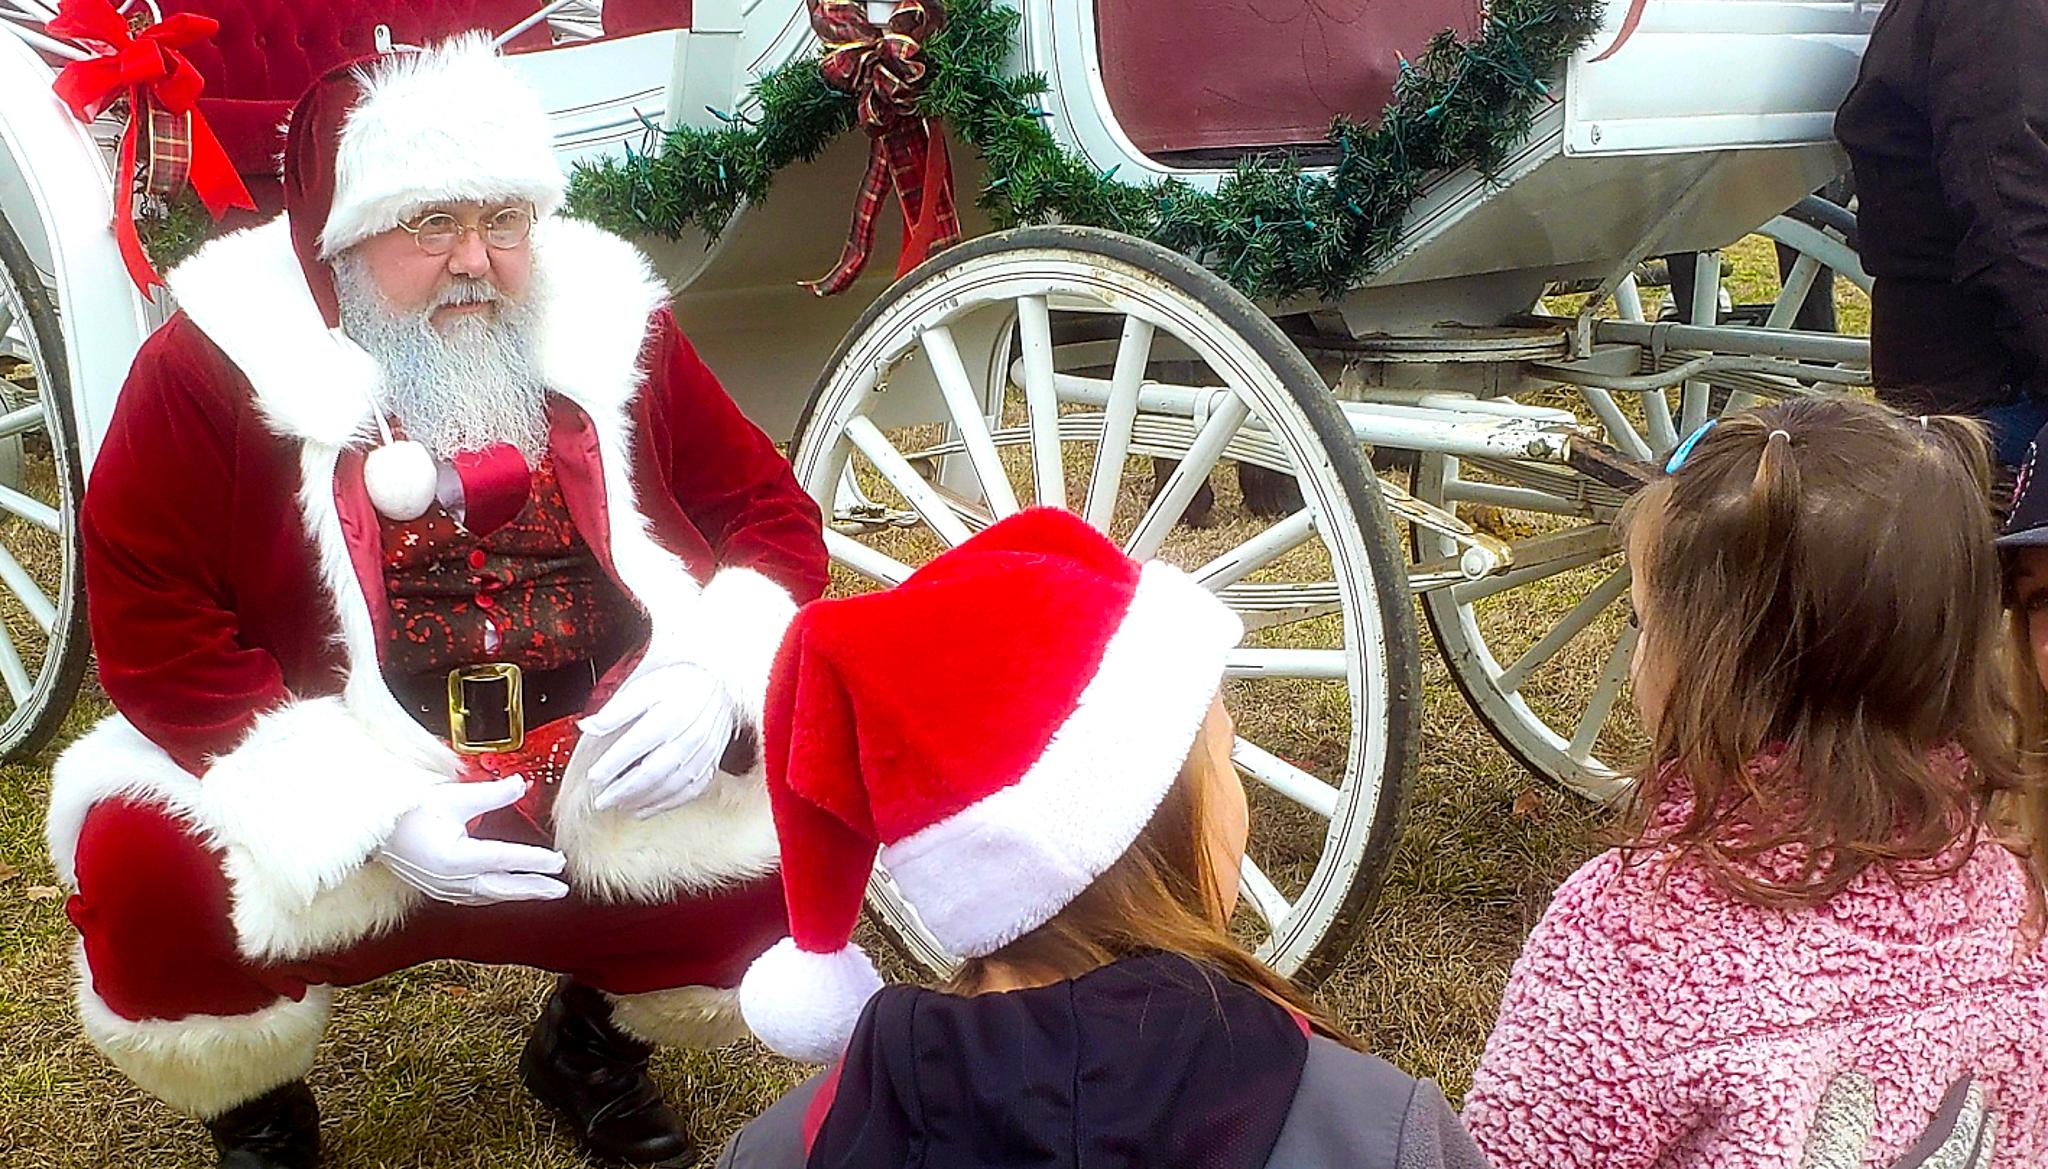 8-December-2019 A visit with Santa